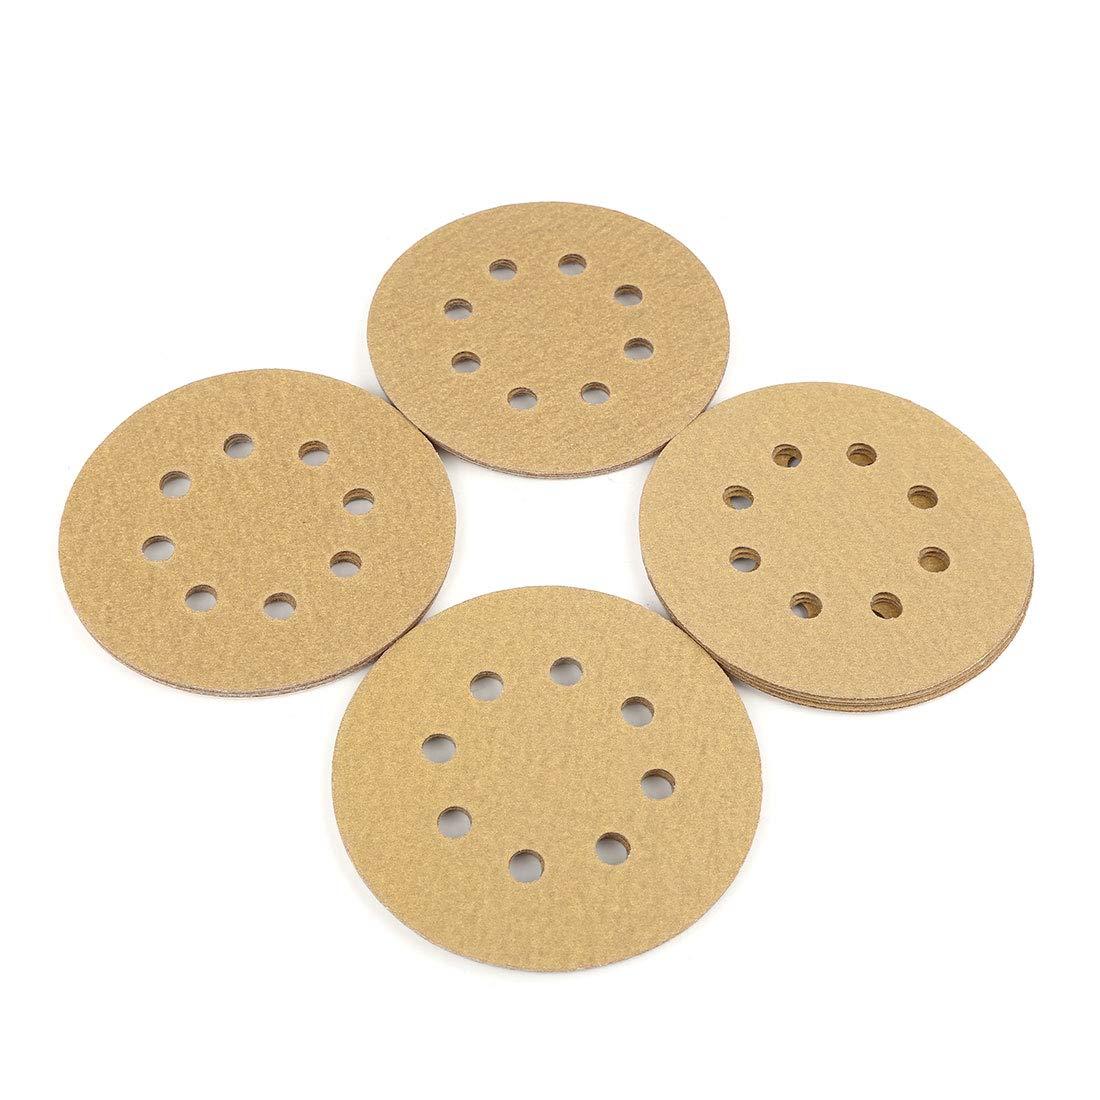 uxcell 20 Pcs 5 Inch 8 Hole Hook and Loop Sanding Discs Sander Pads 180 Grit Sandpaper